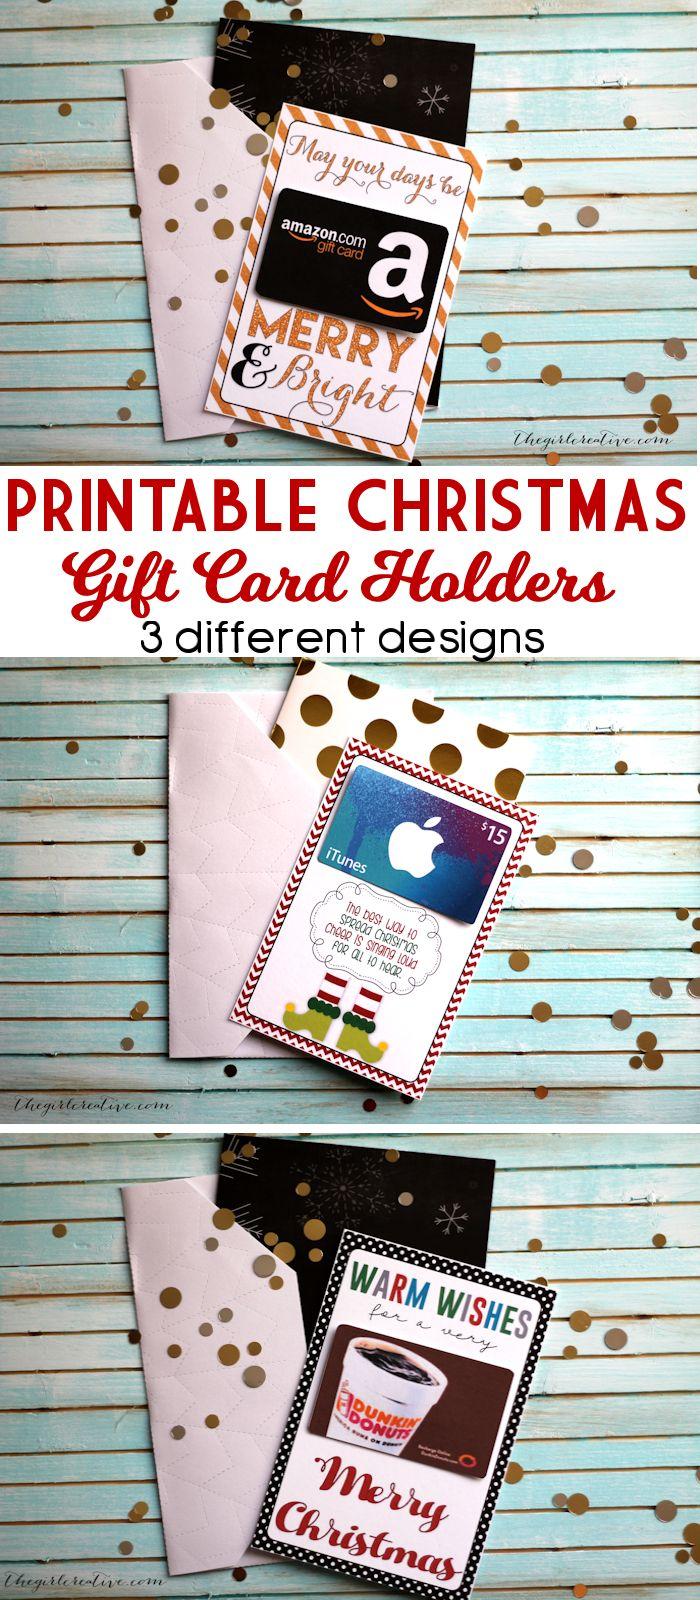 Free Printable Christmas Gift Card Holders- perfect for neighbor or teacher Christmas gifts